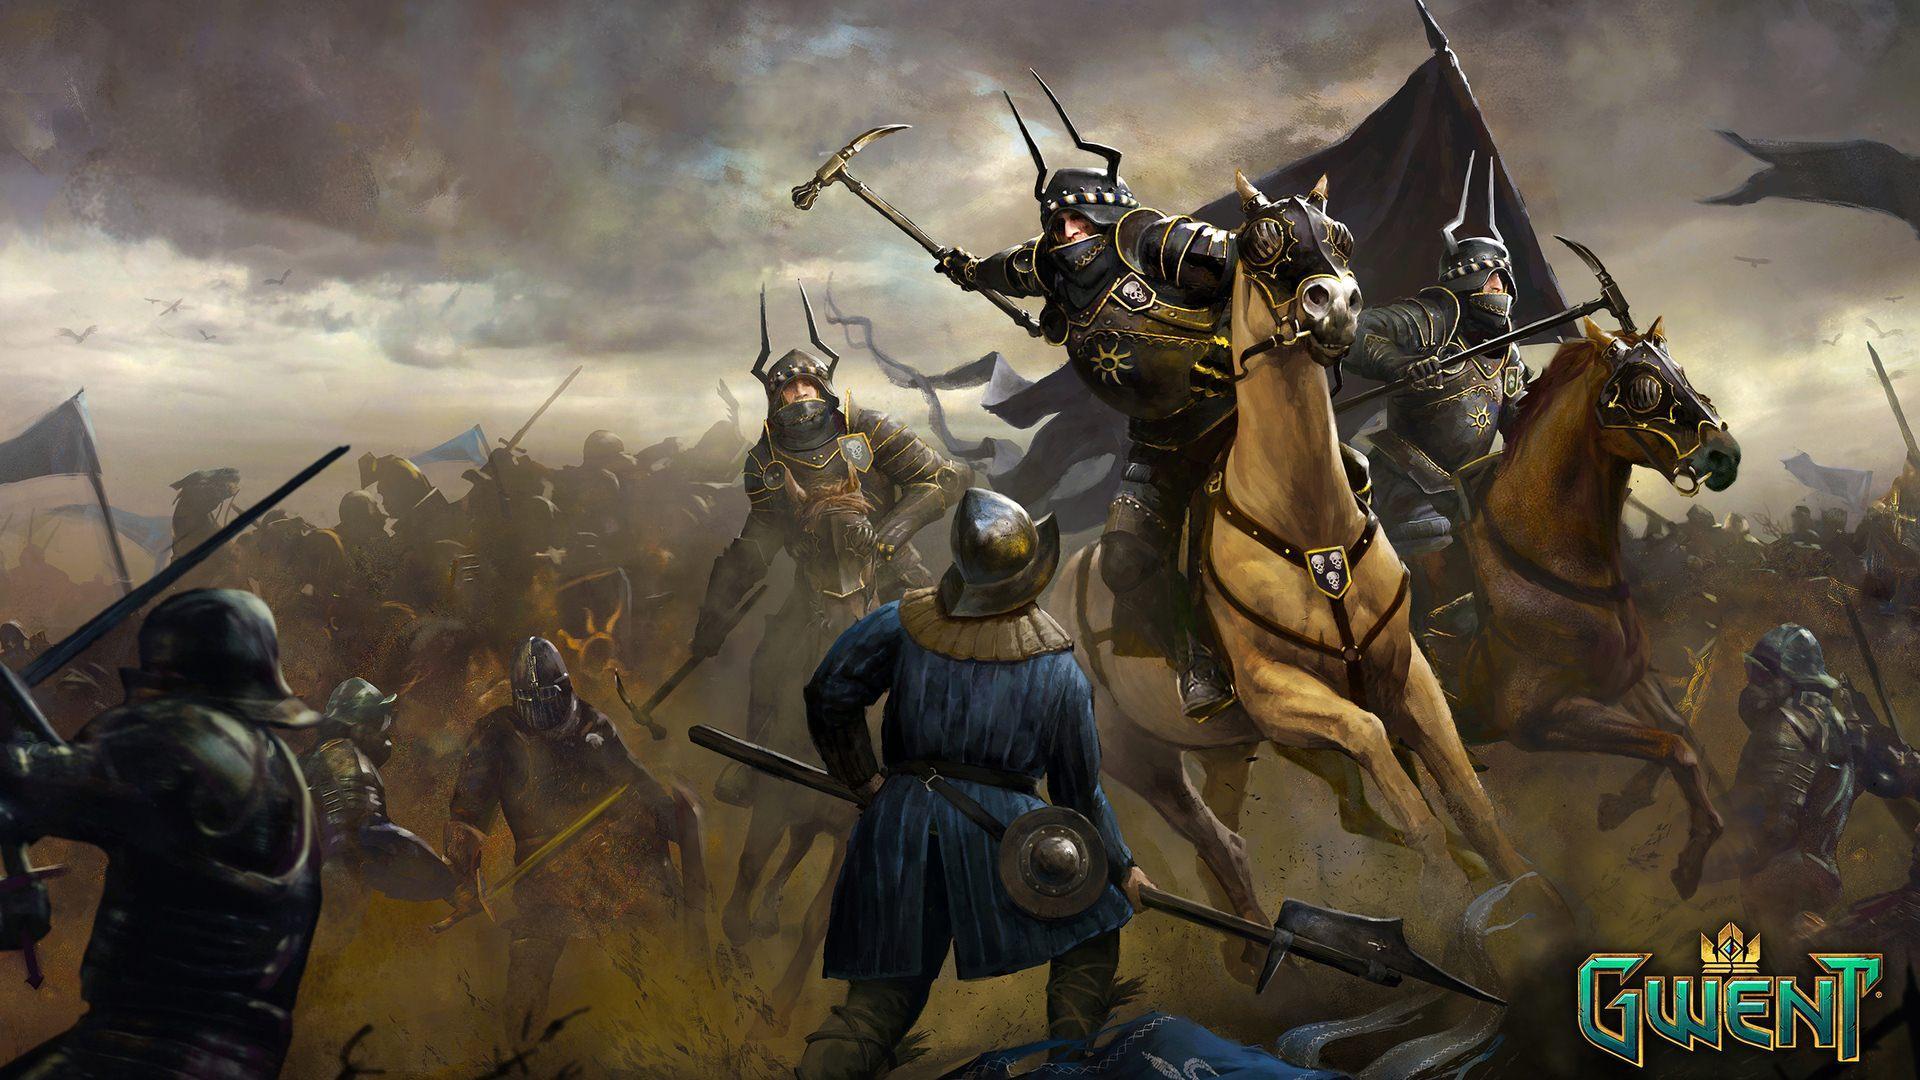 Knight Battle Wallpapers Top Free Knight Battle Backgrounds Wallpaperaccess